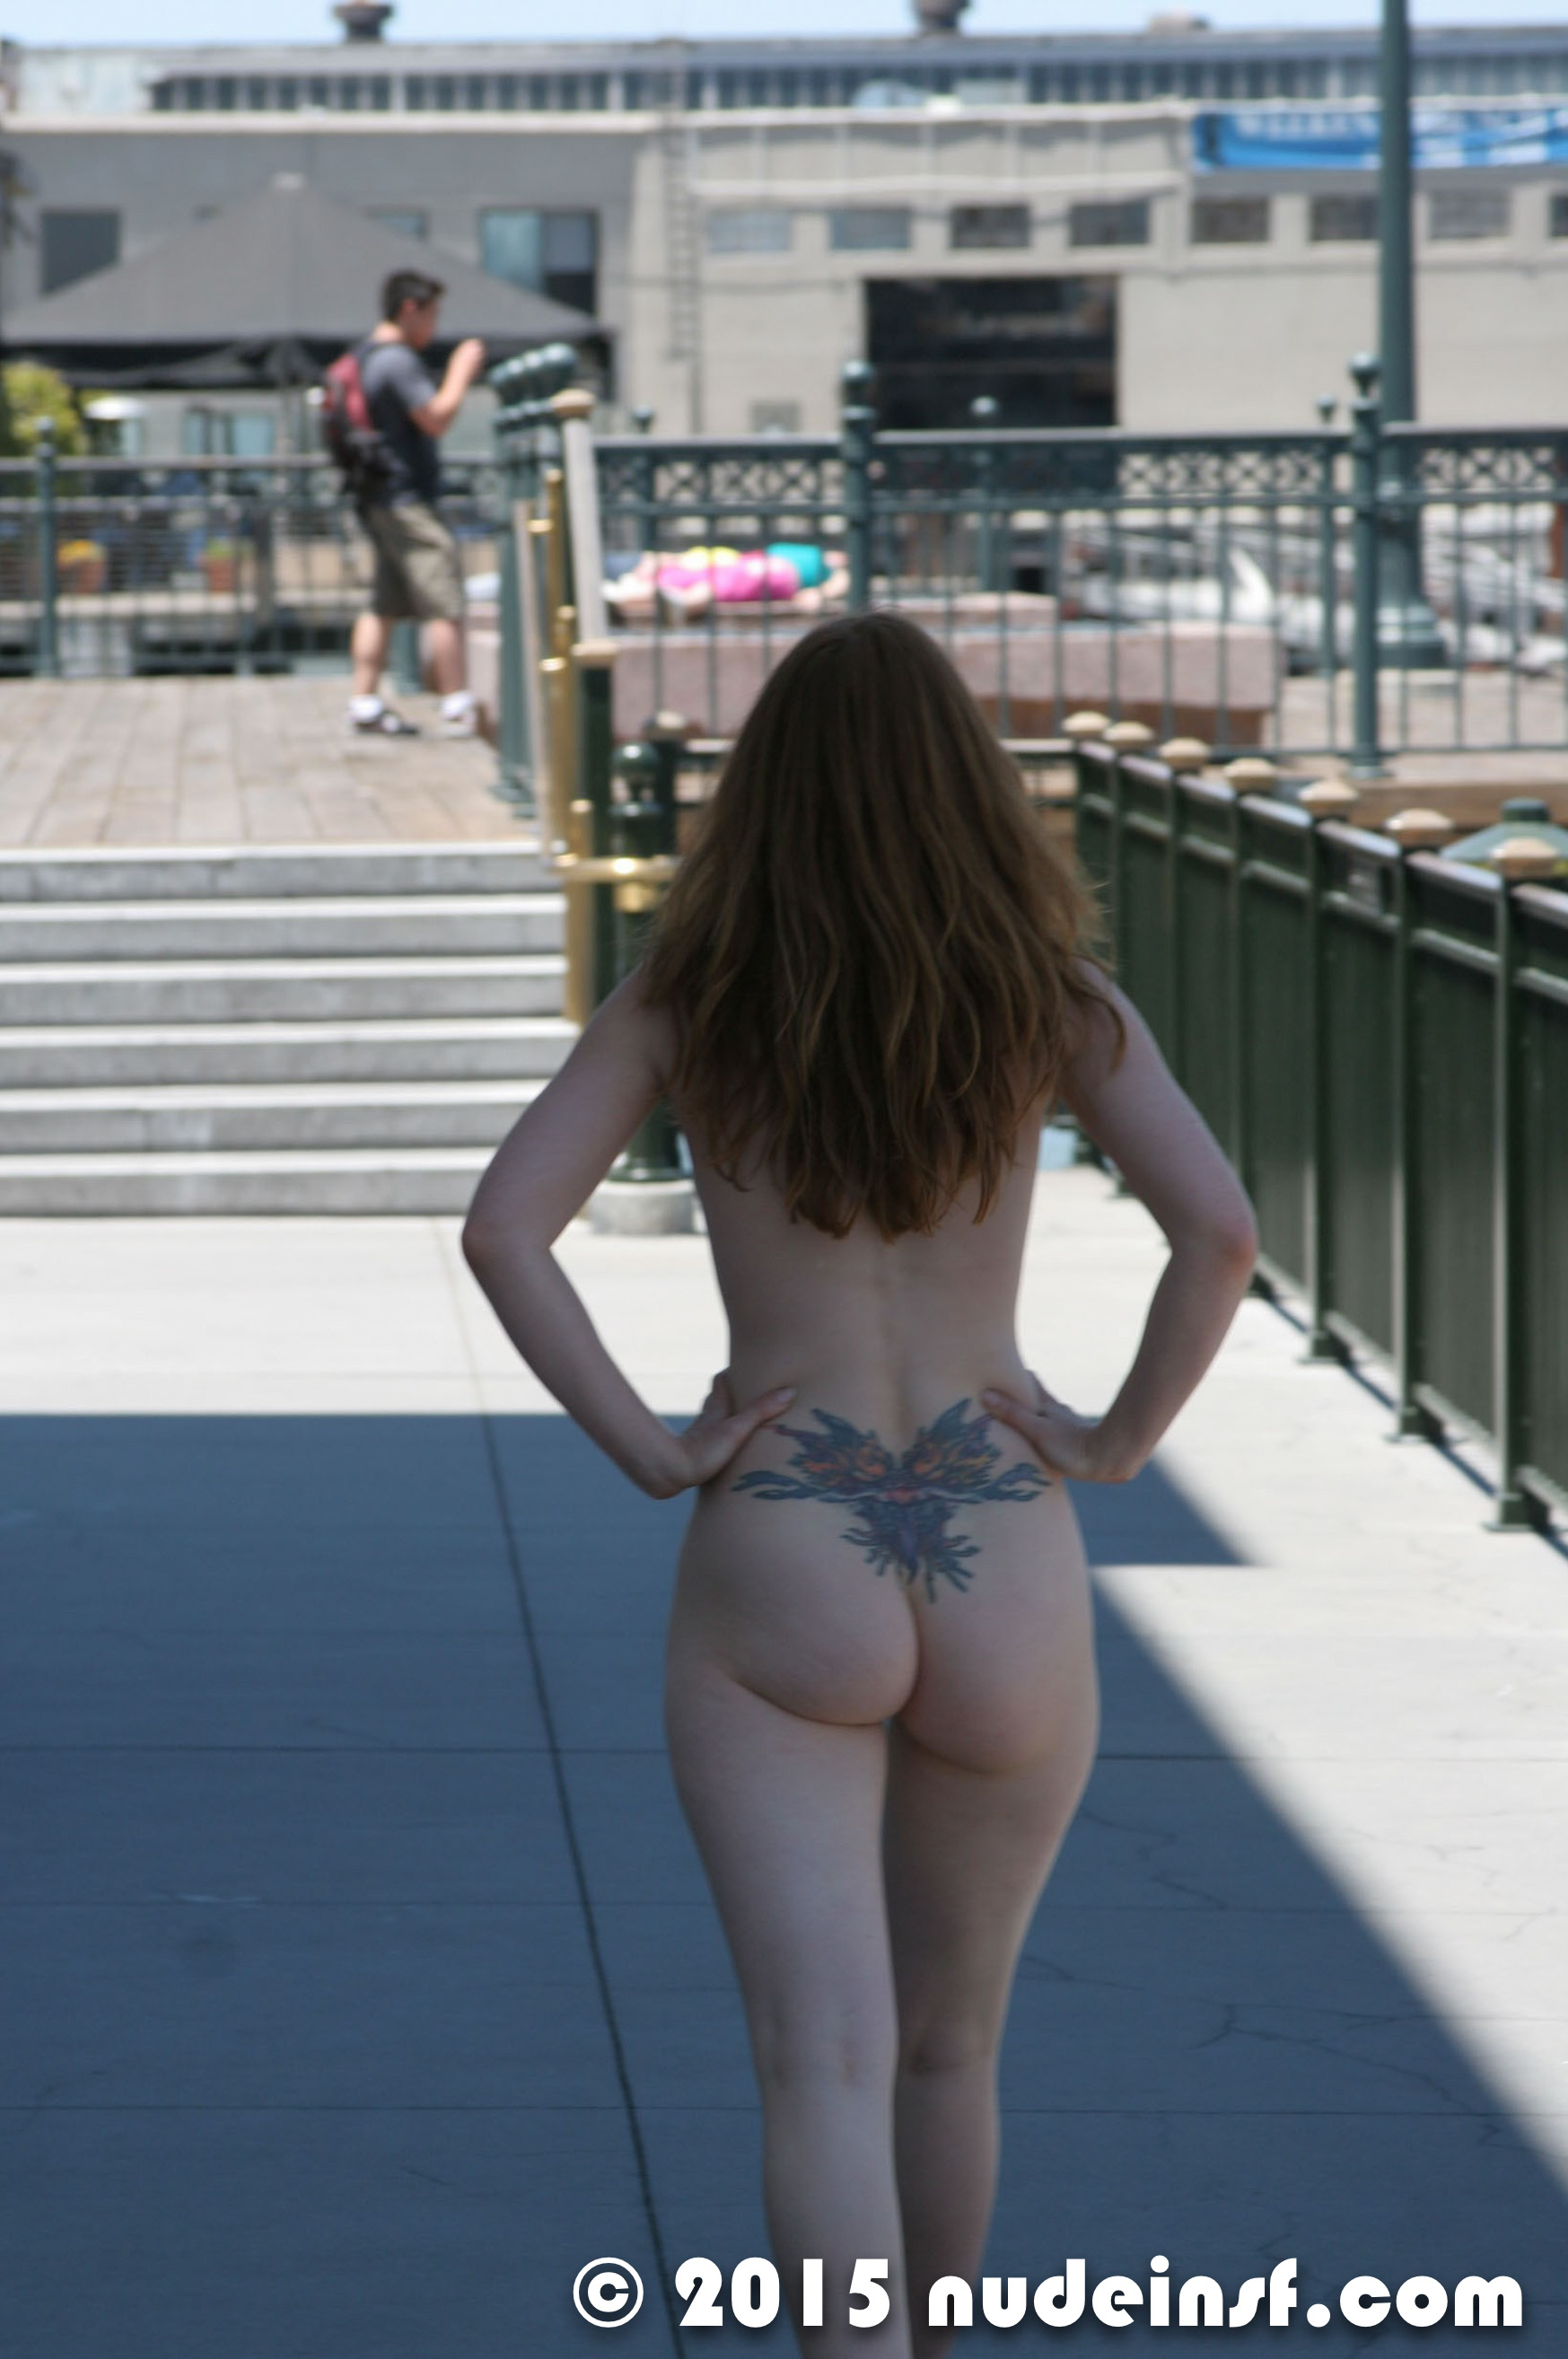 Amber - Public nudity in San Francisco California